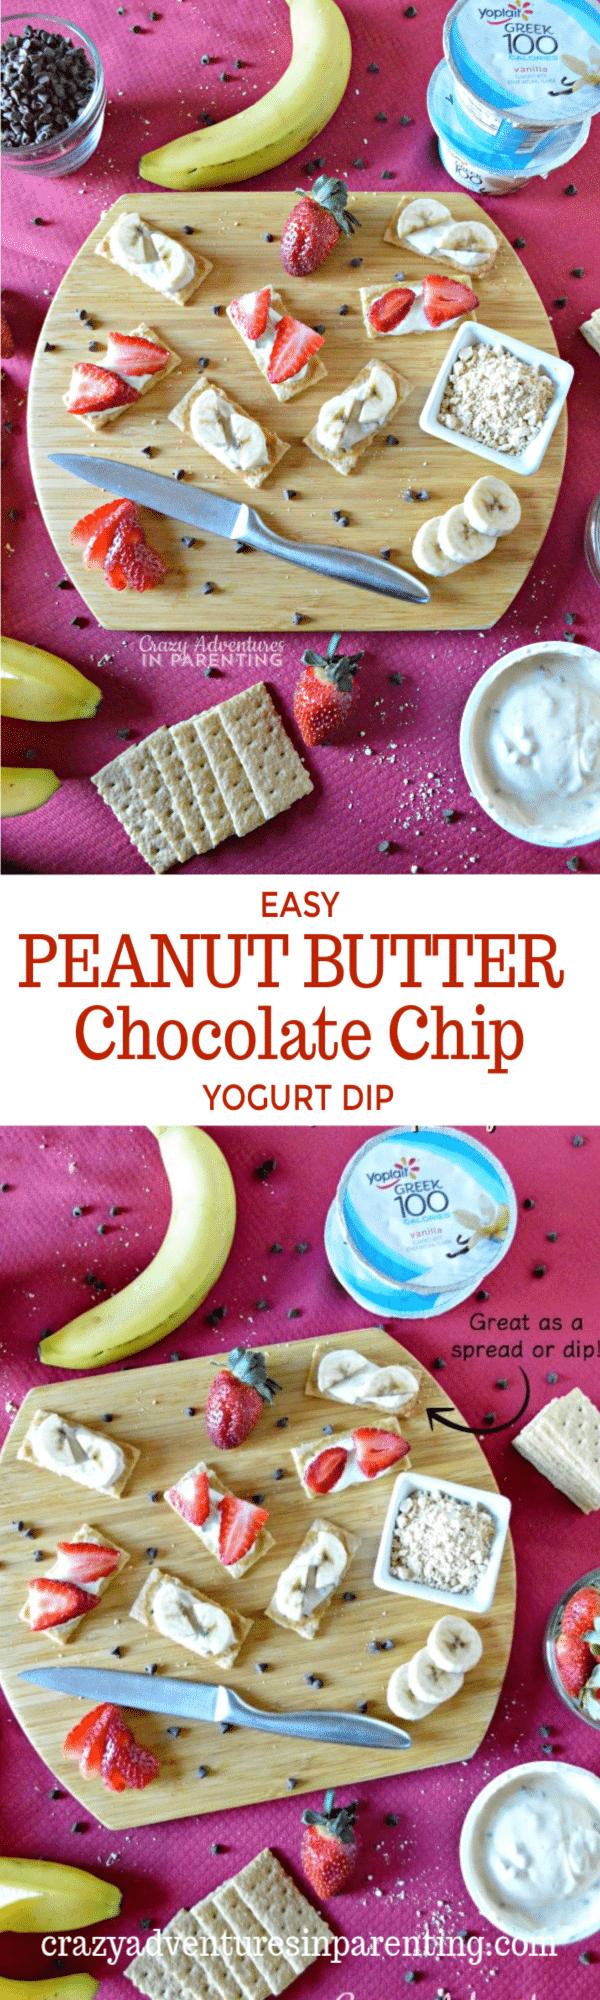 Easy Peanut Butter Chocolate Chip Yogurt Dip